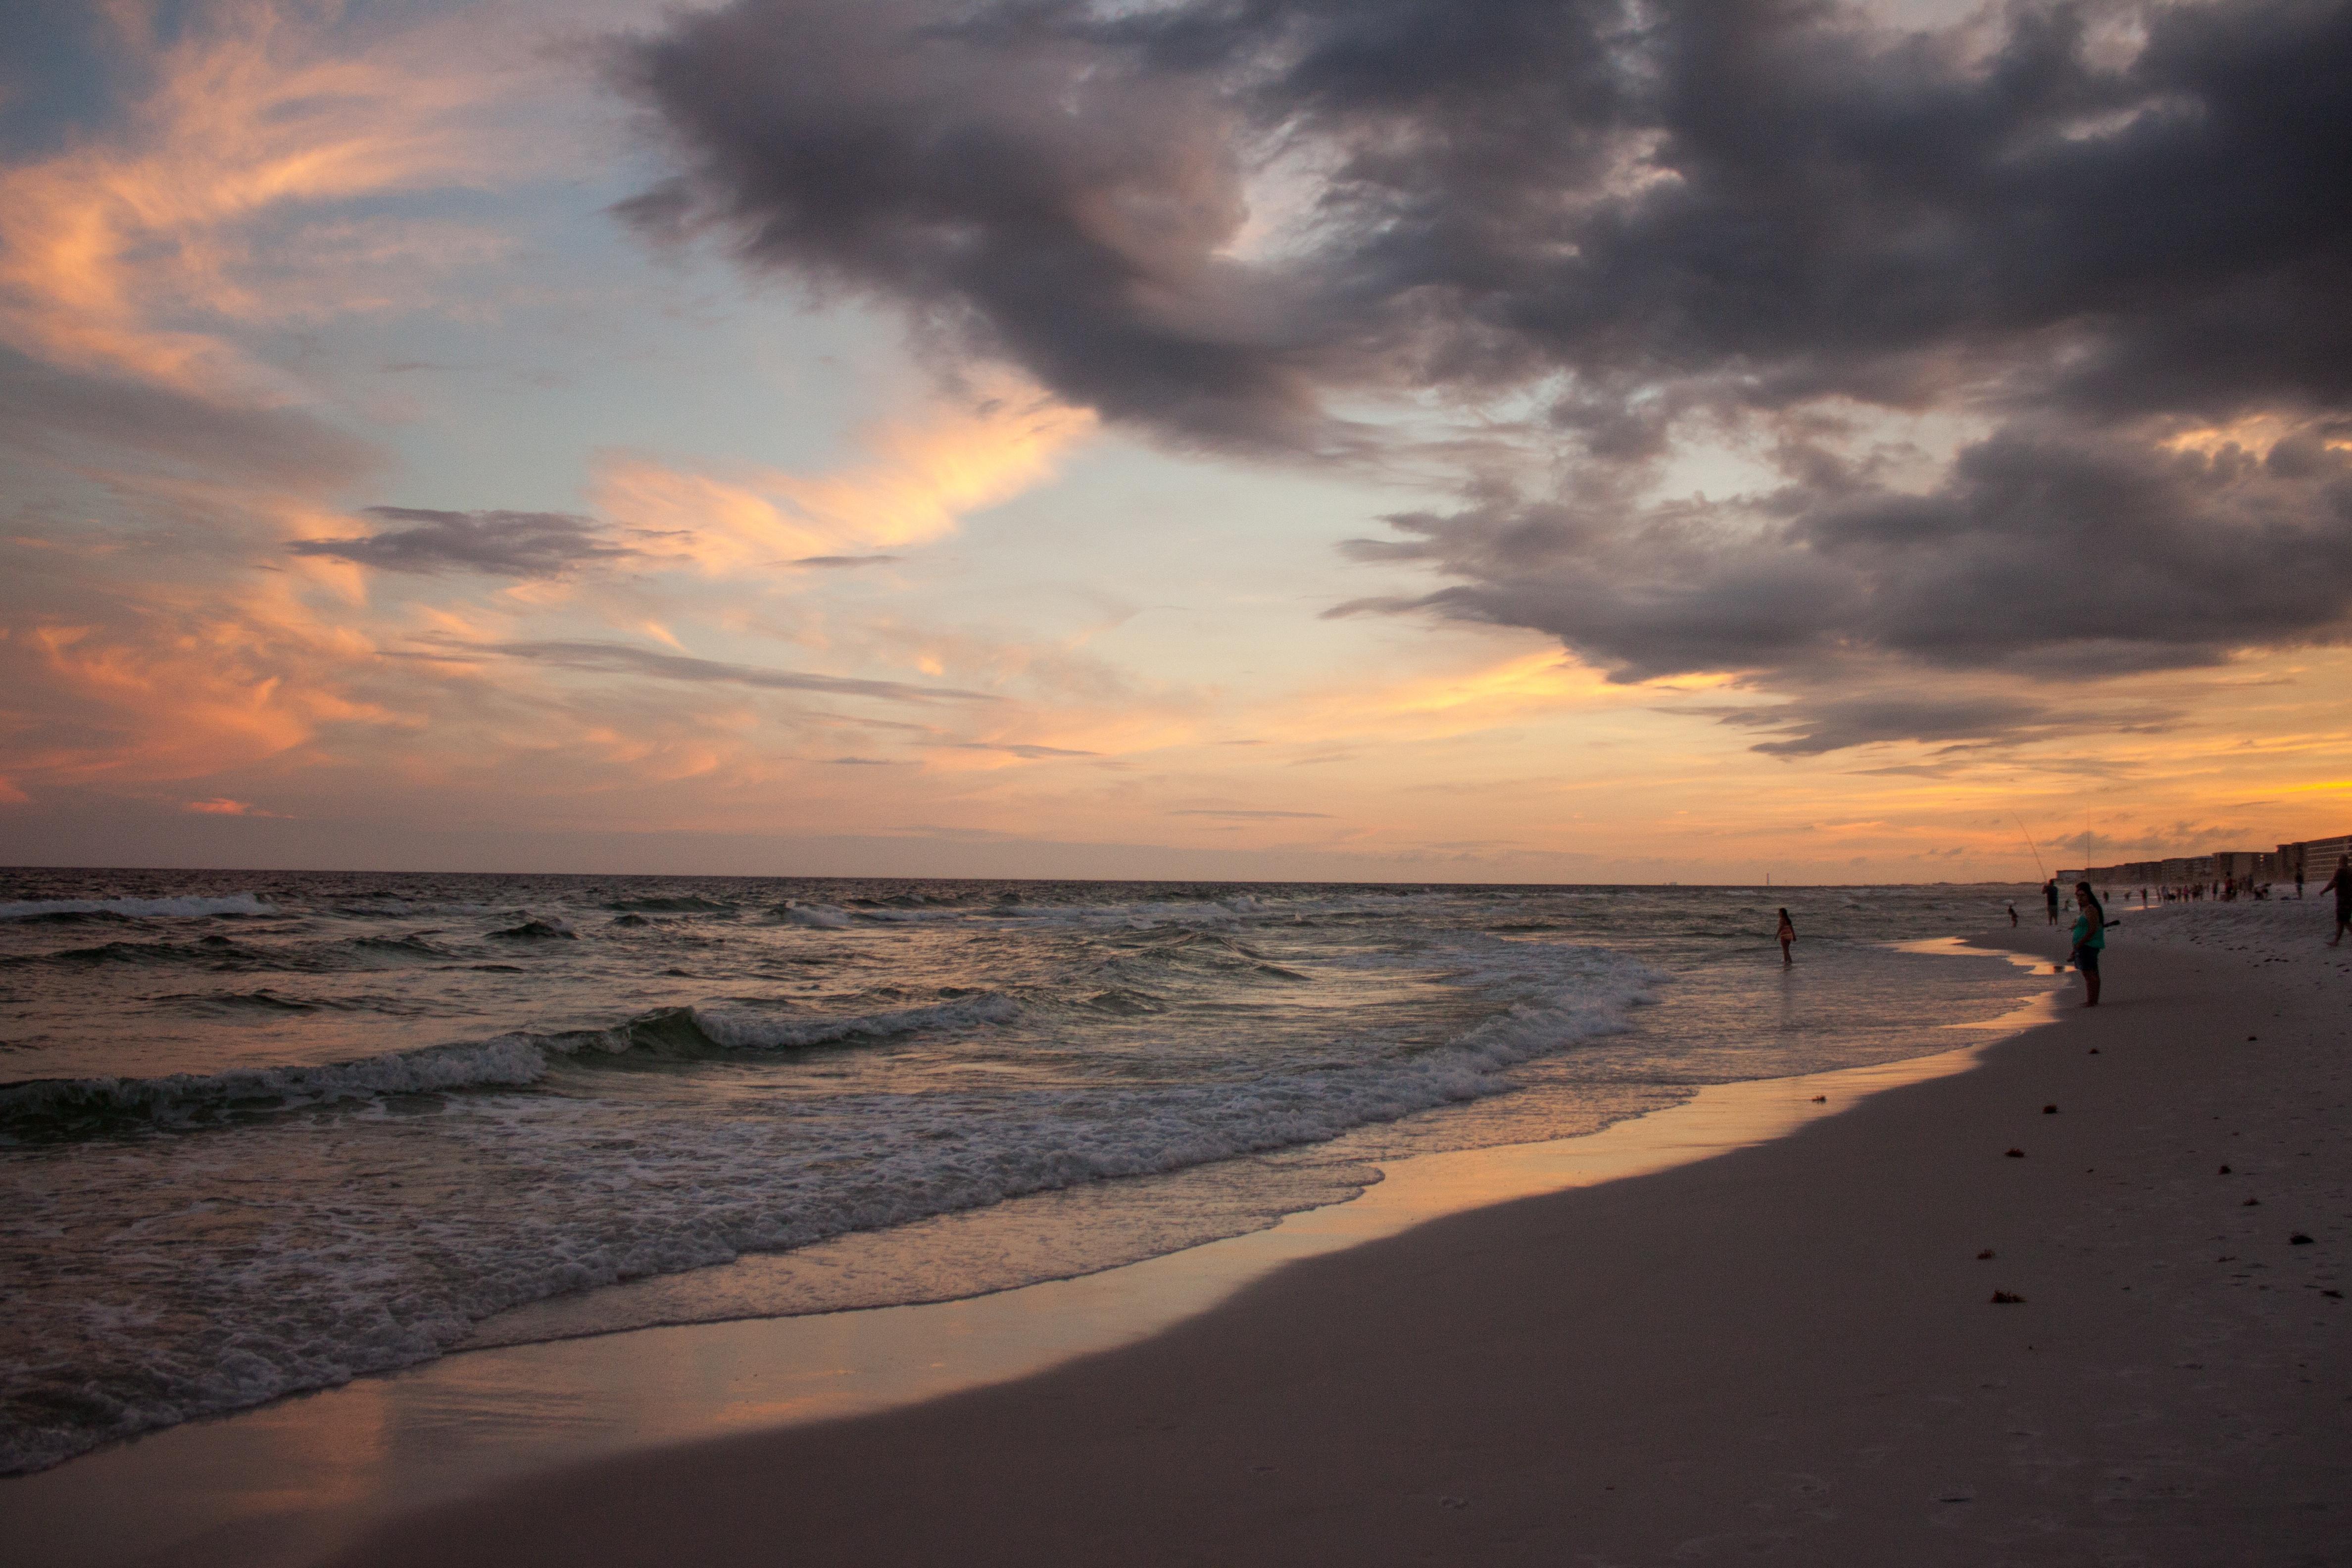 Beach Sea Coast Sand Ocean Horizon Cloud Sky Sun Sunrise Sunset Sunlight Morning Shore Wave Dawn